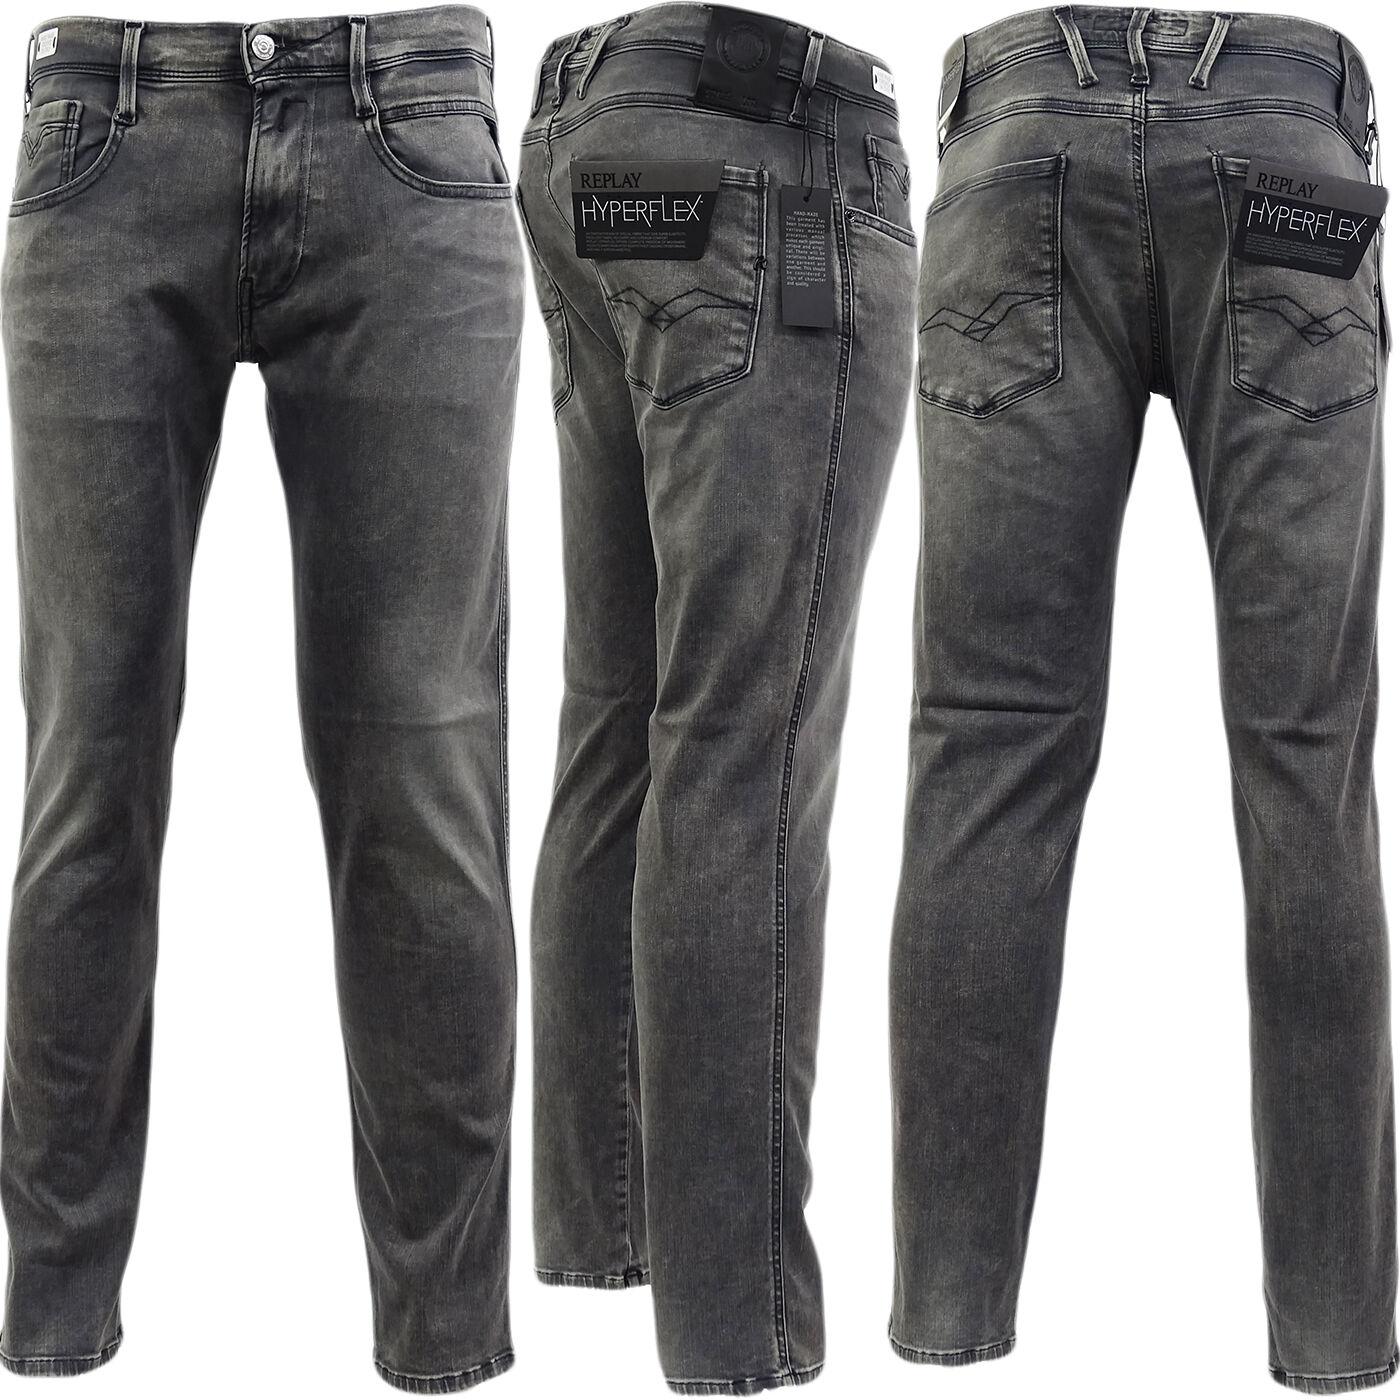 Replay Grey Anbass Slim Fit Stretch 'Hyperflex' Jean   Denim Pants - M914 661-07